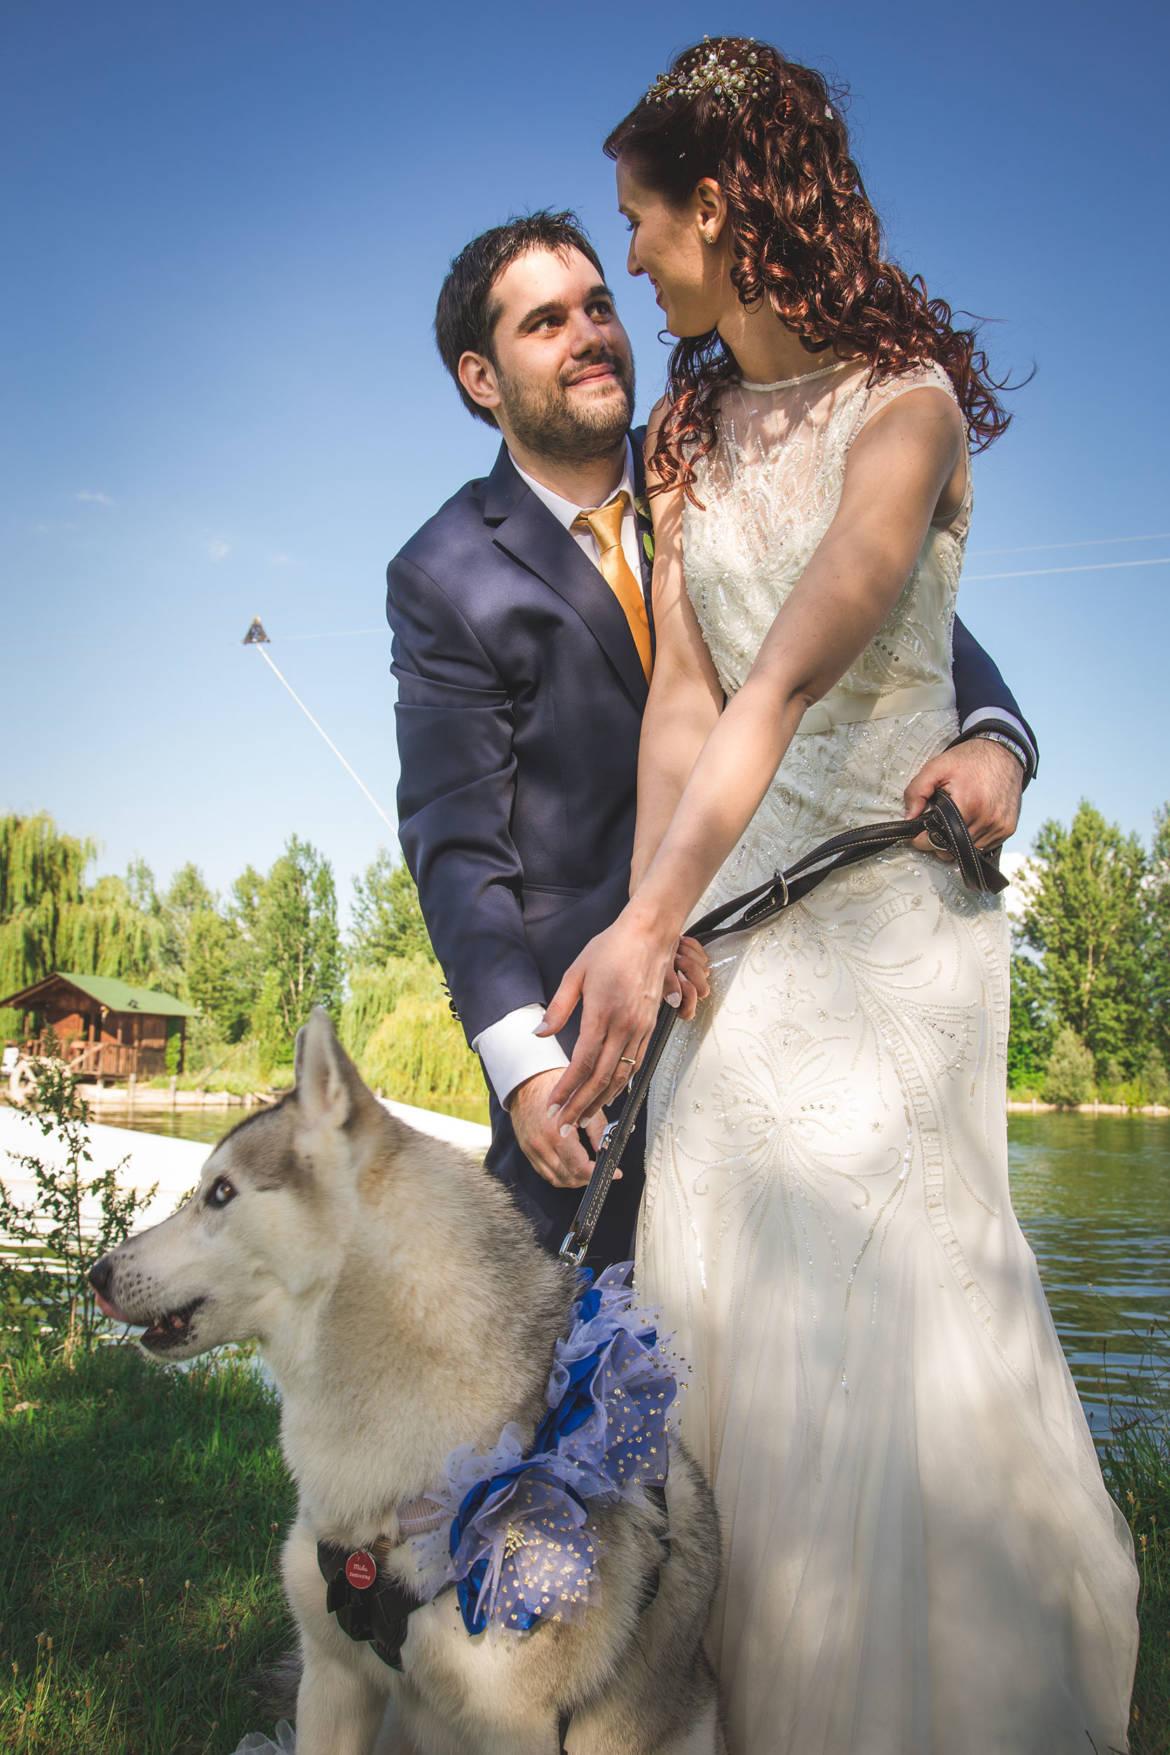 Matrimonio-Enrico-e-Mirna-22.jpg